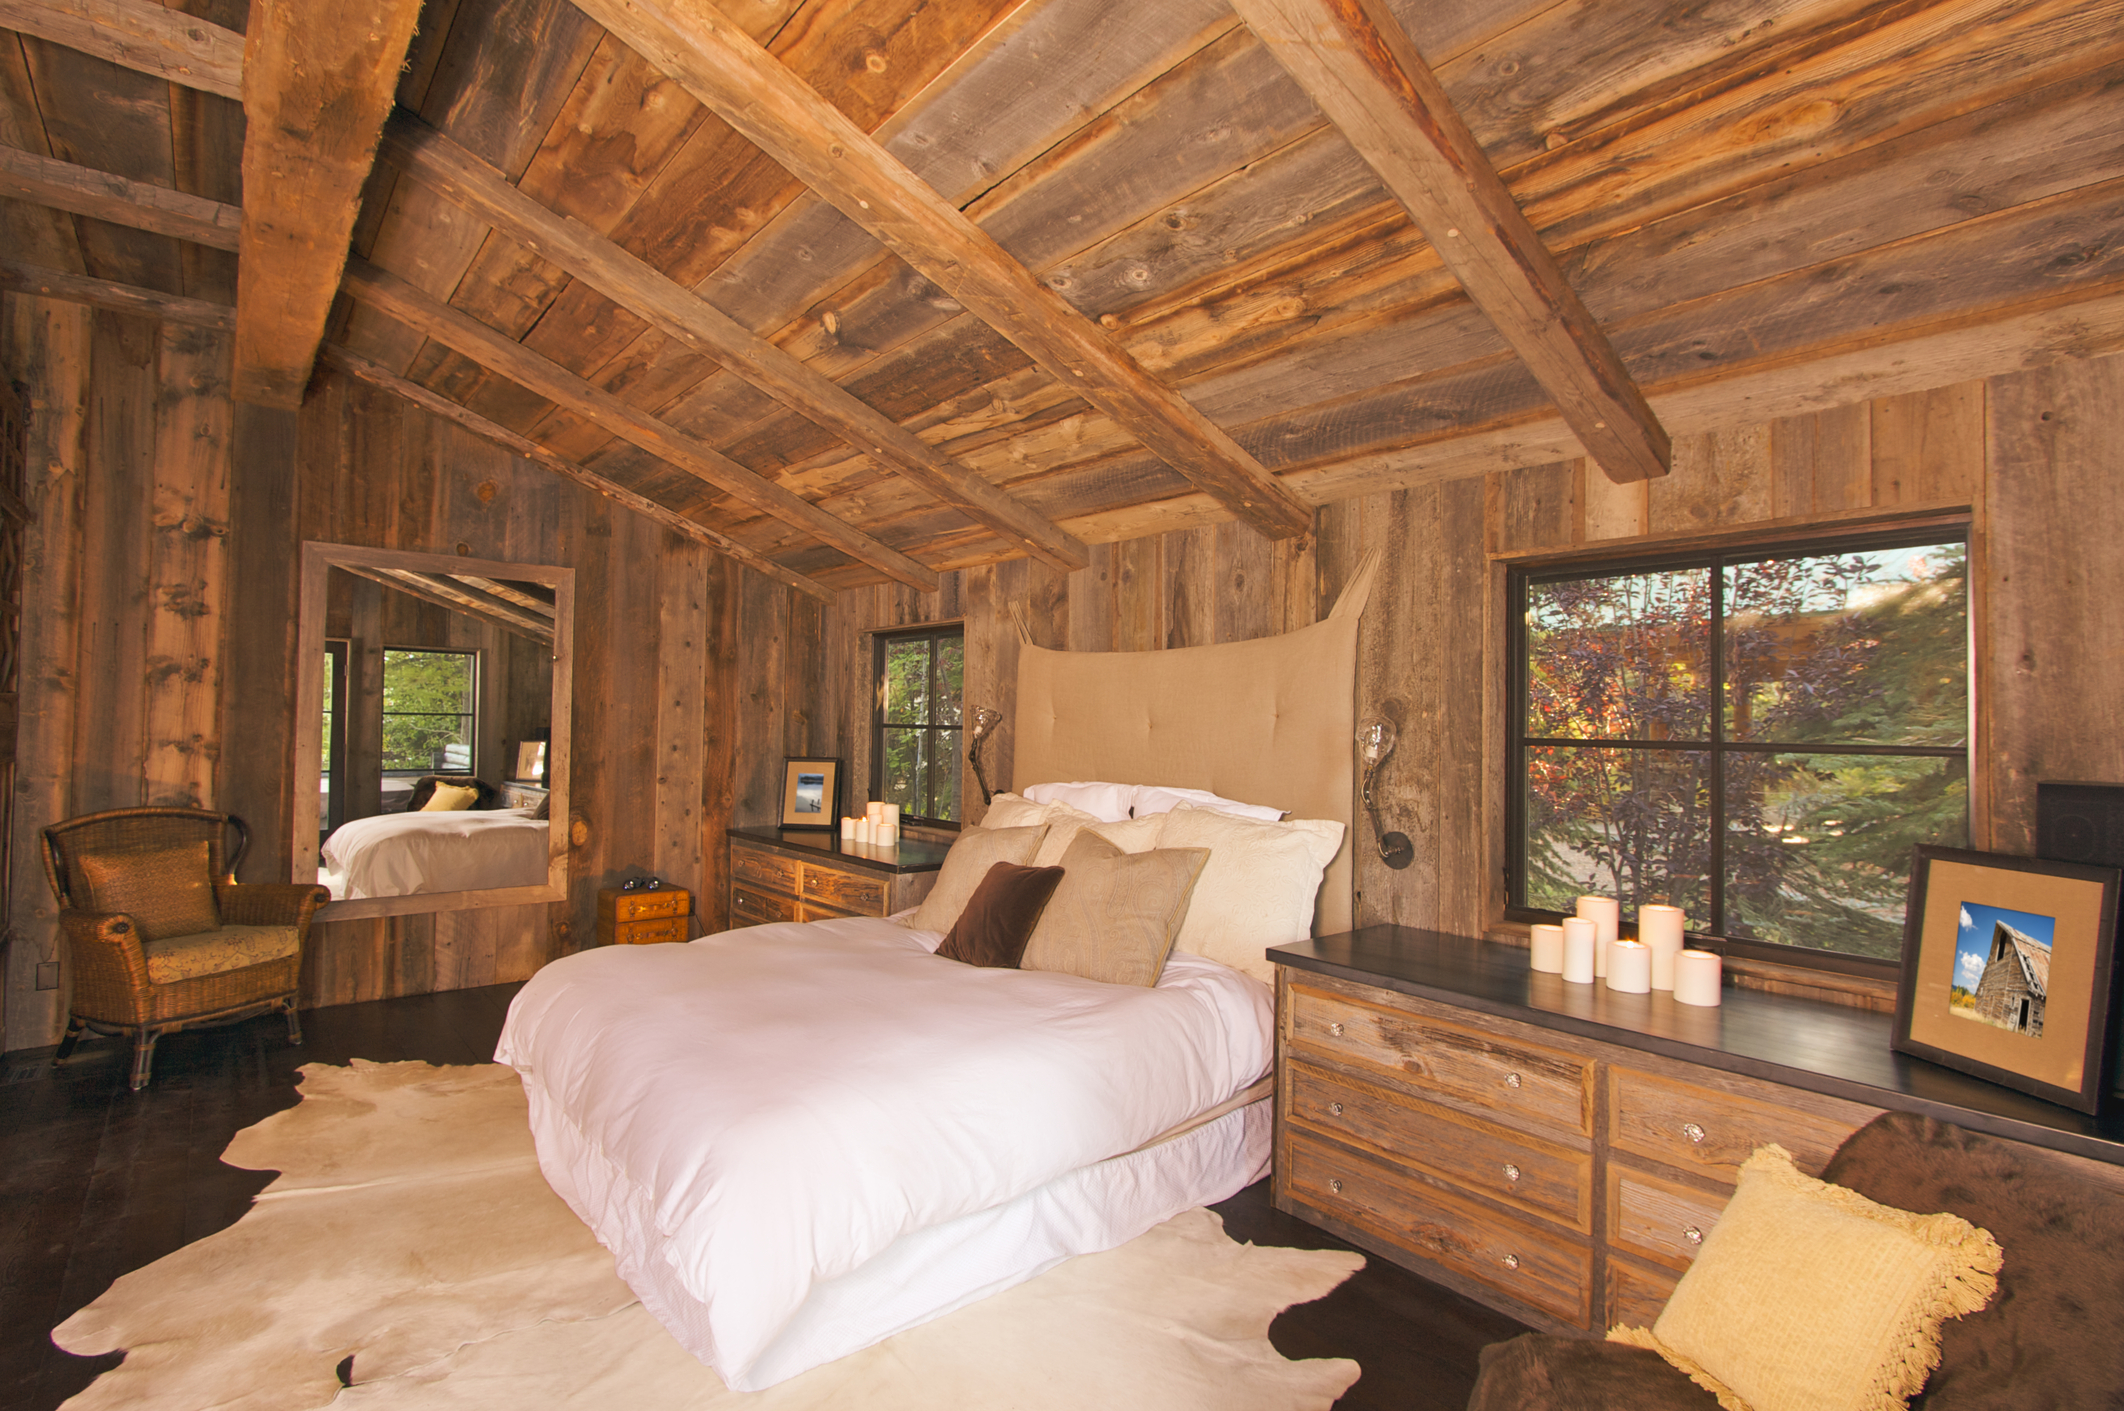 Rusztikus feh r h l szoba fundamenta otthonok s megold sok - Fotos de lofts decorados ...